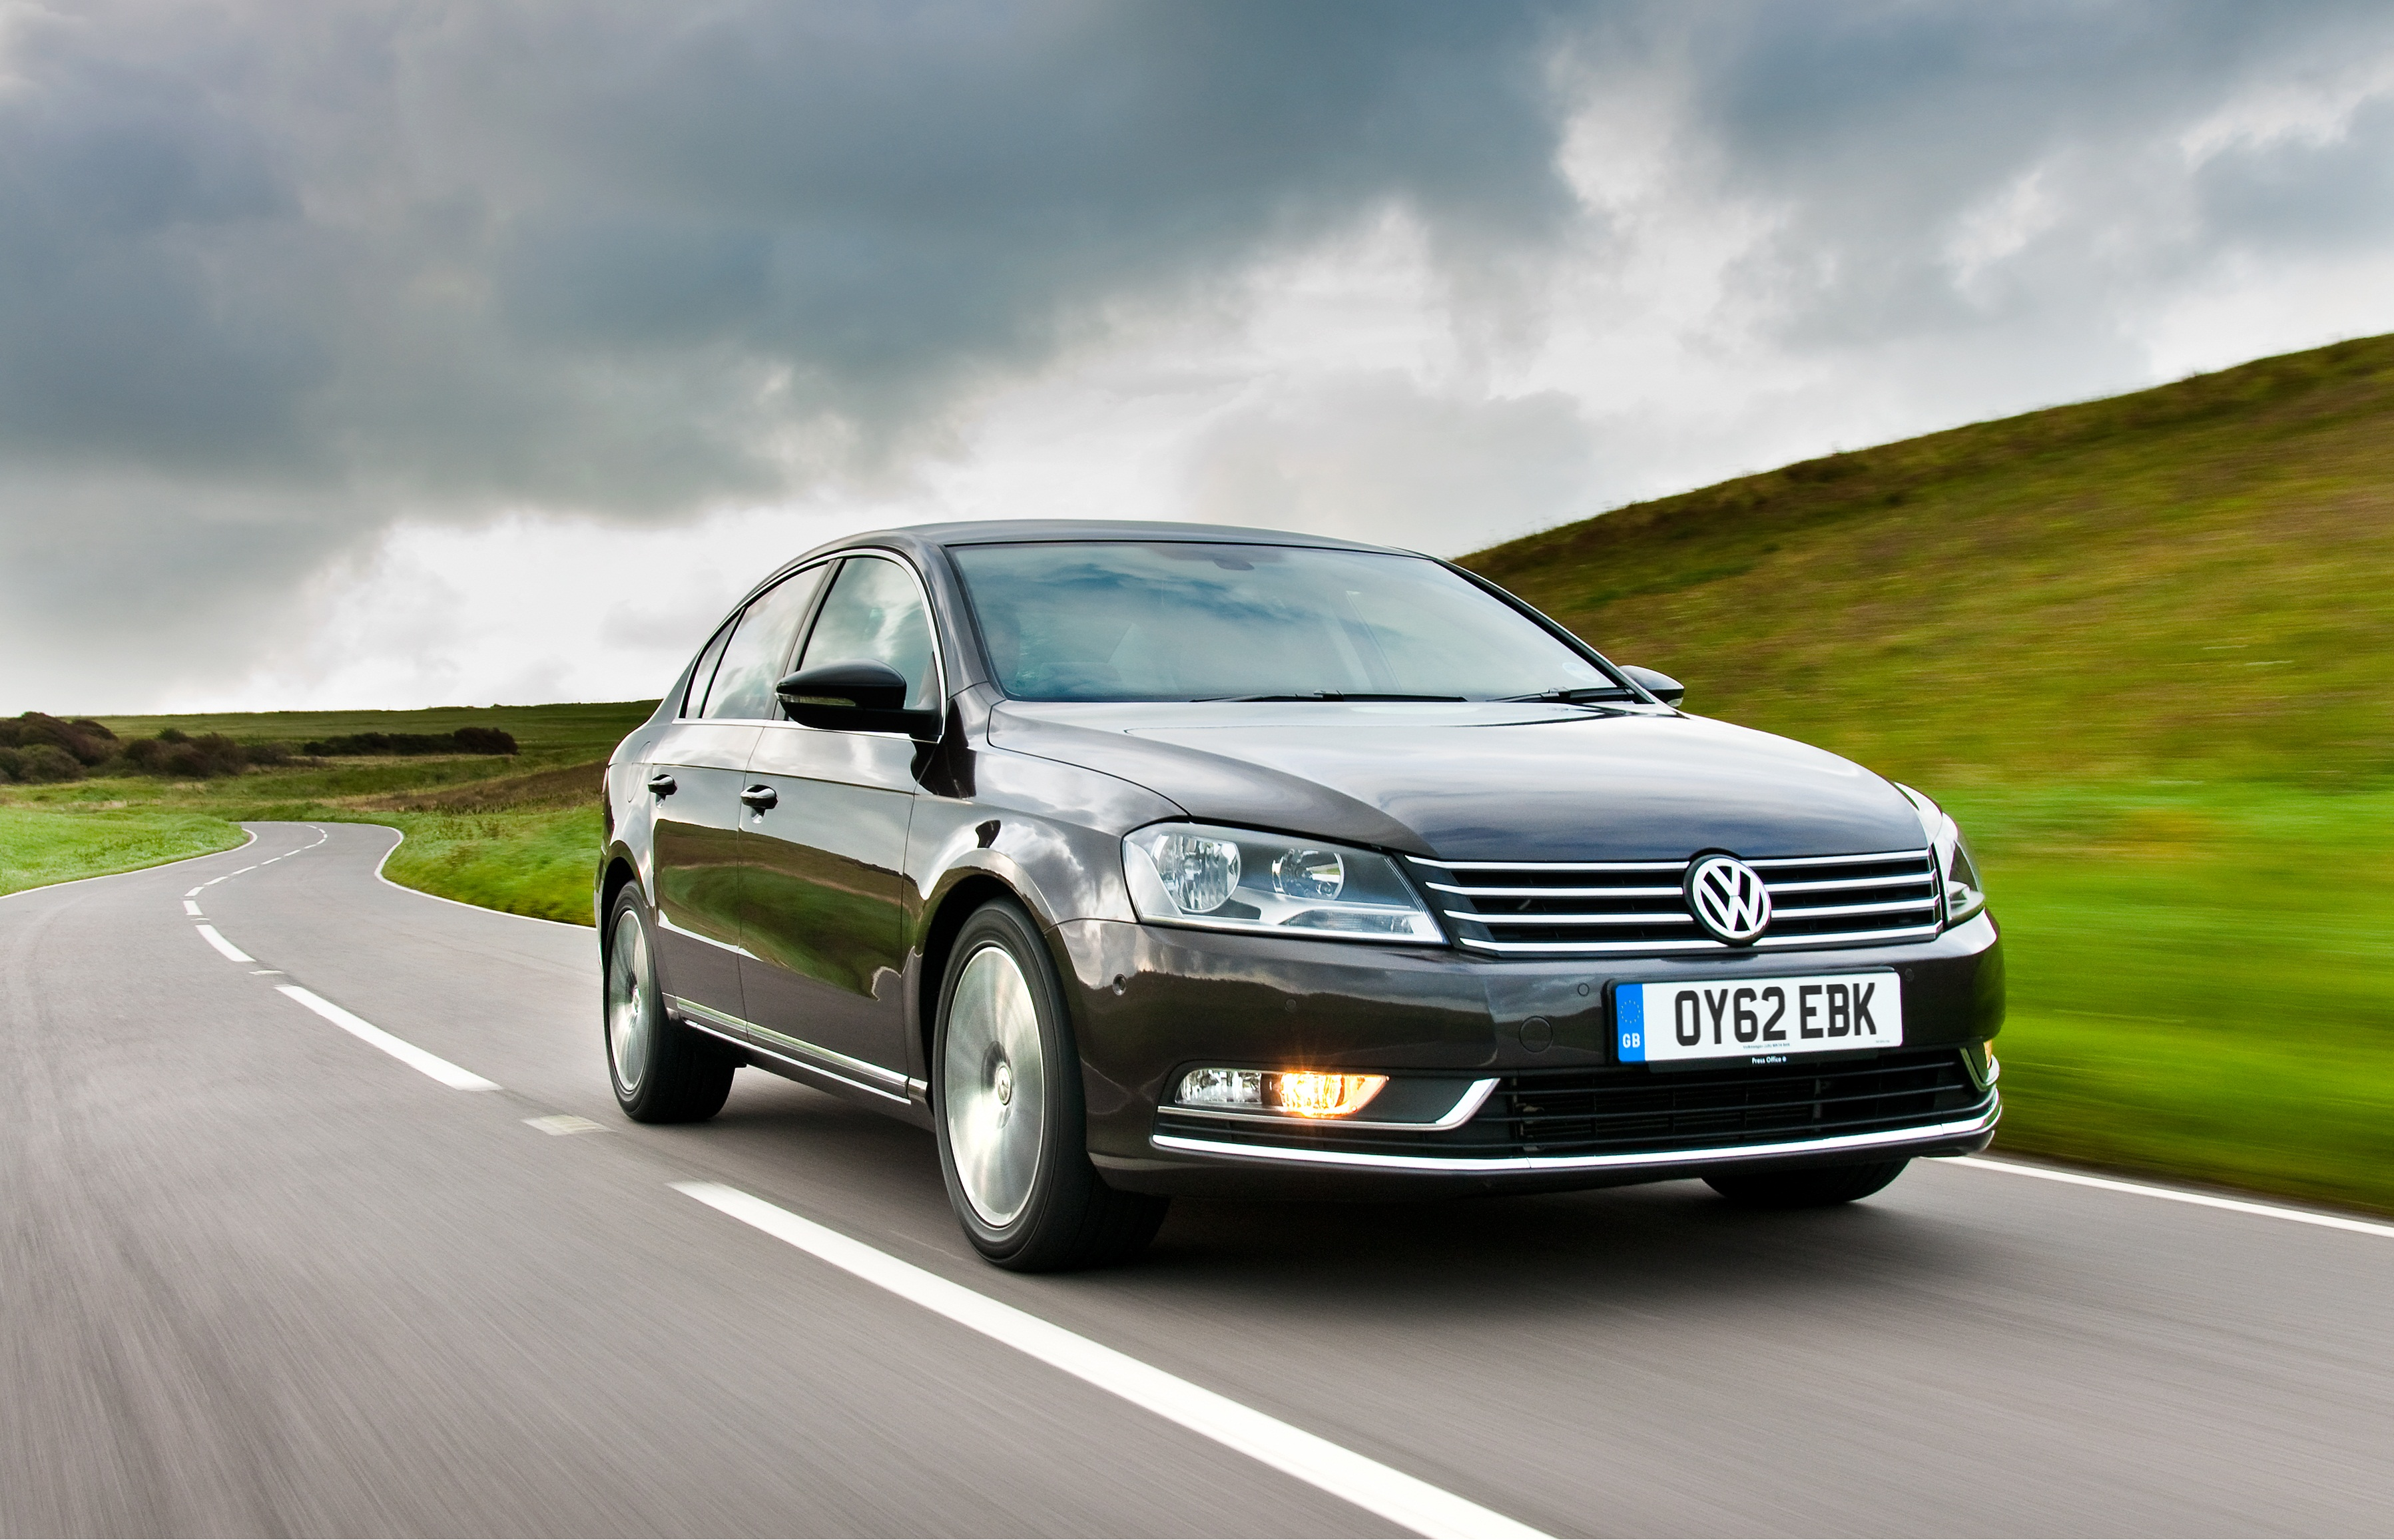 Satılık 2013 model Volkswagen Passat Sedan